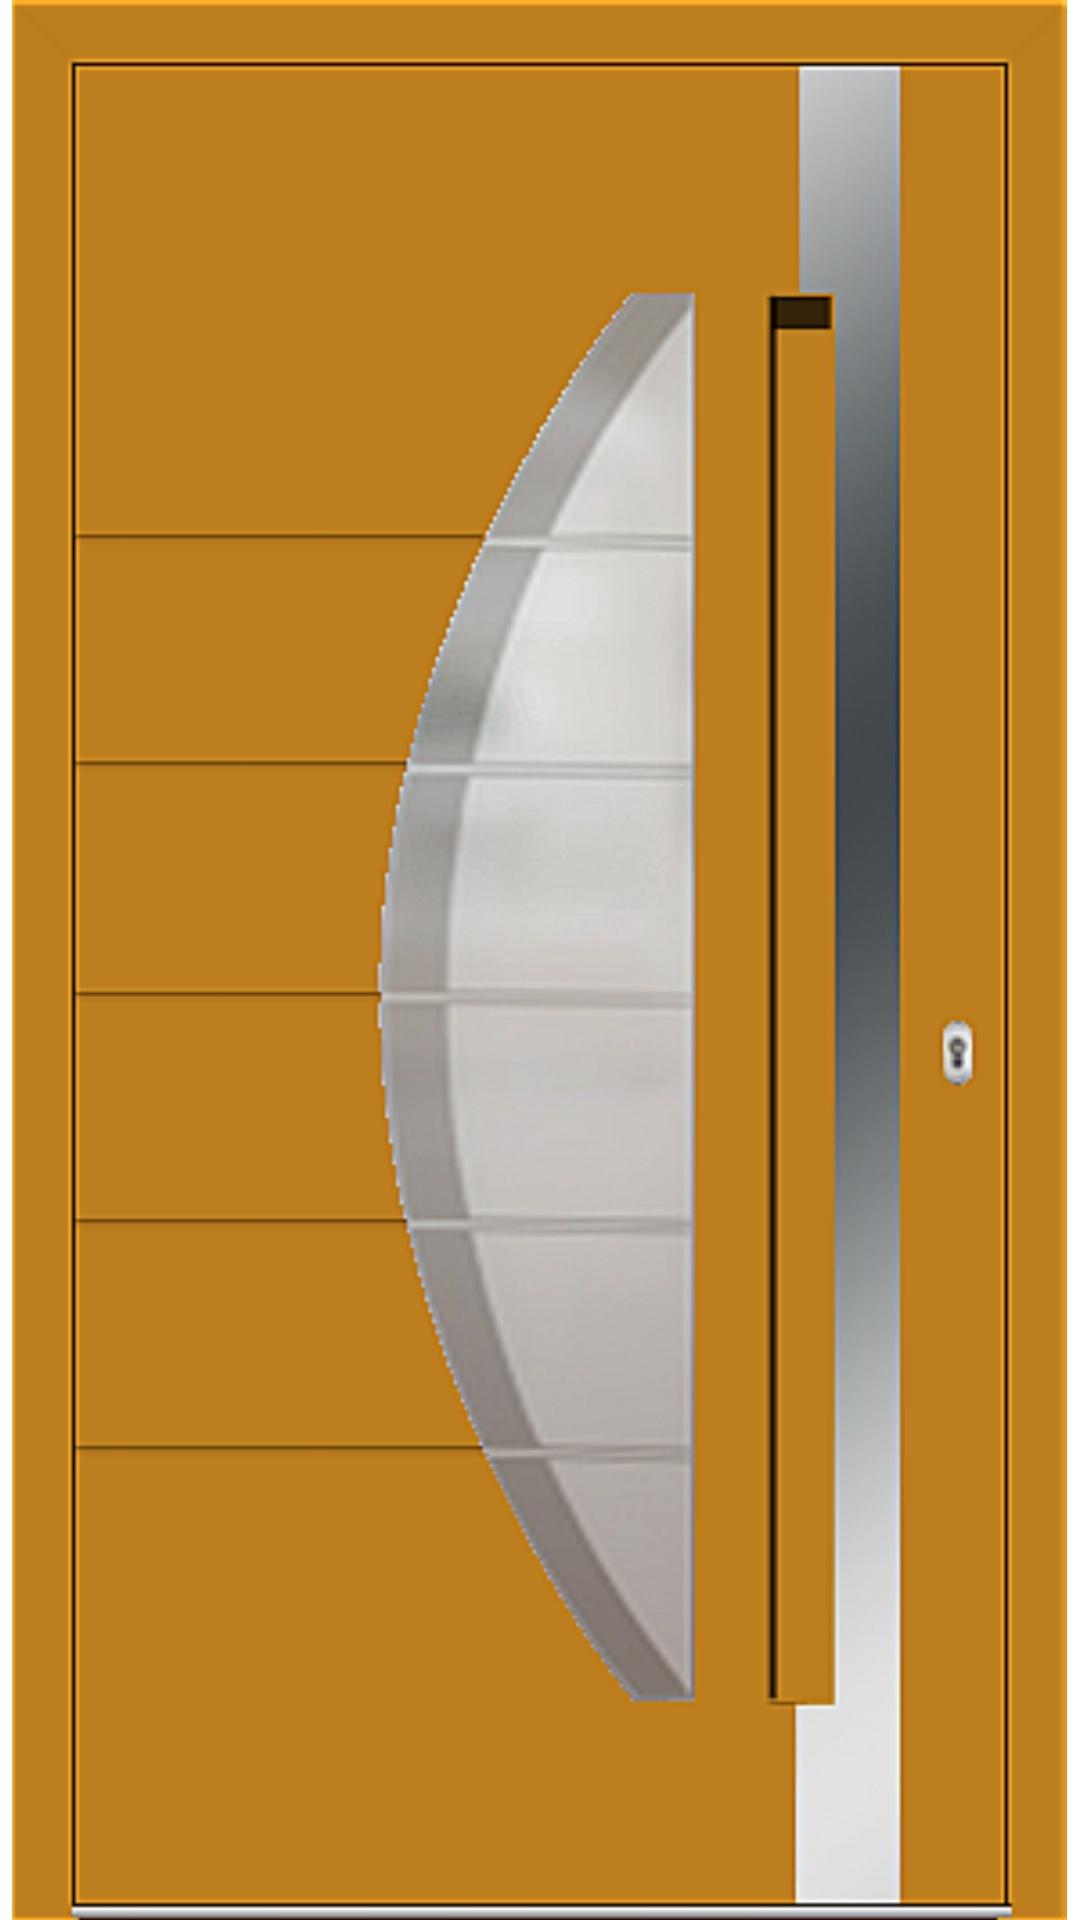 Kunststoff Haustür Modell 6973-40 honiggelb